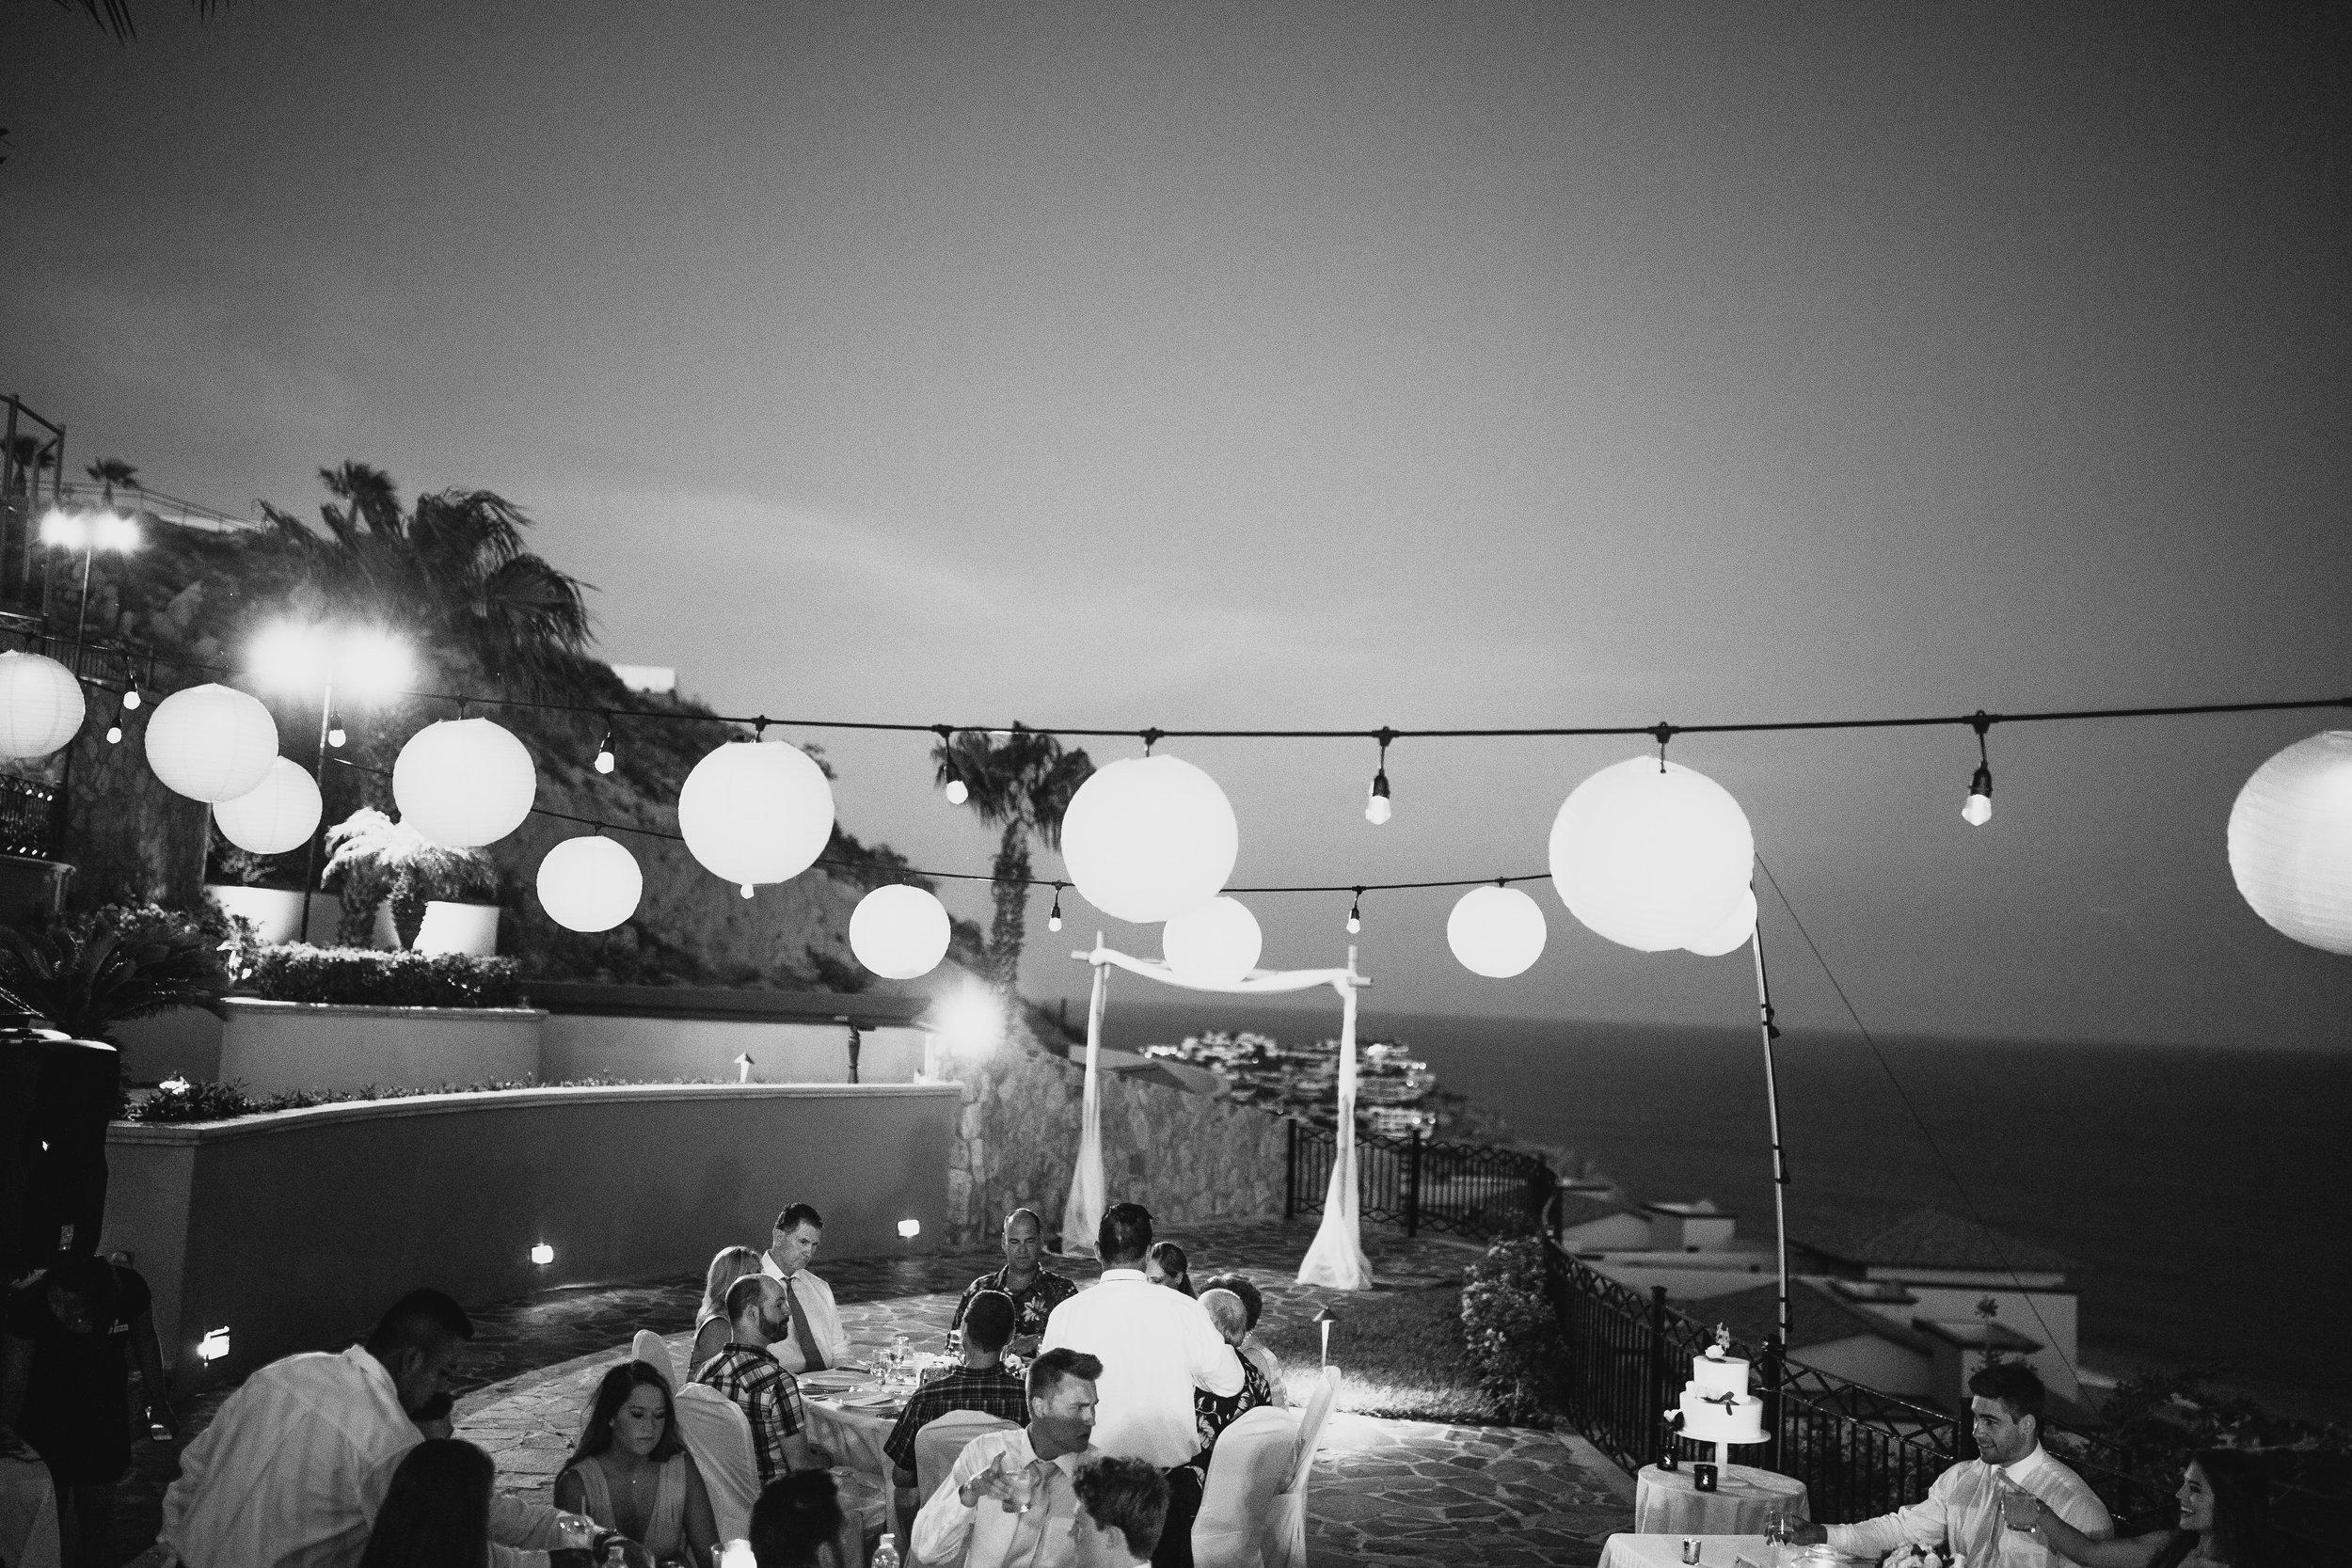 pueblo-bonito-sunset-beach-wedding-cabo-san-lucas642.jpg